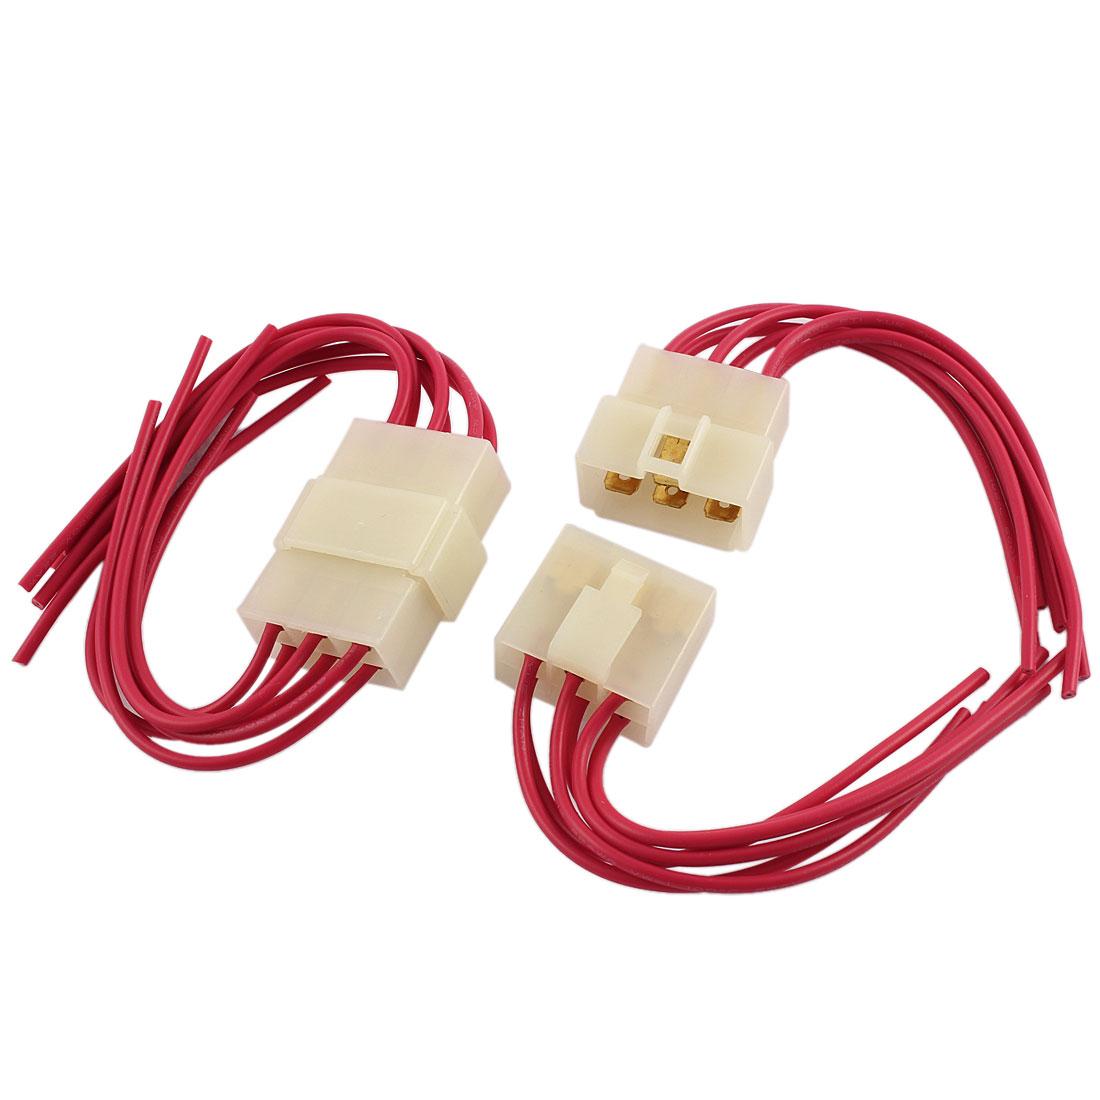 2 pcs car audio radio stereo wiring harness 6 pin wire adapter rh walmart ca radio wiring adapter stereo wire harness adapter